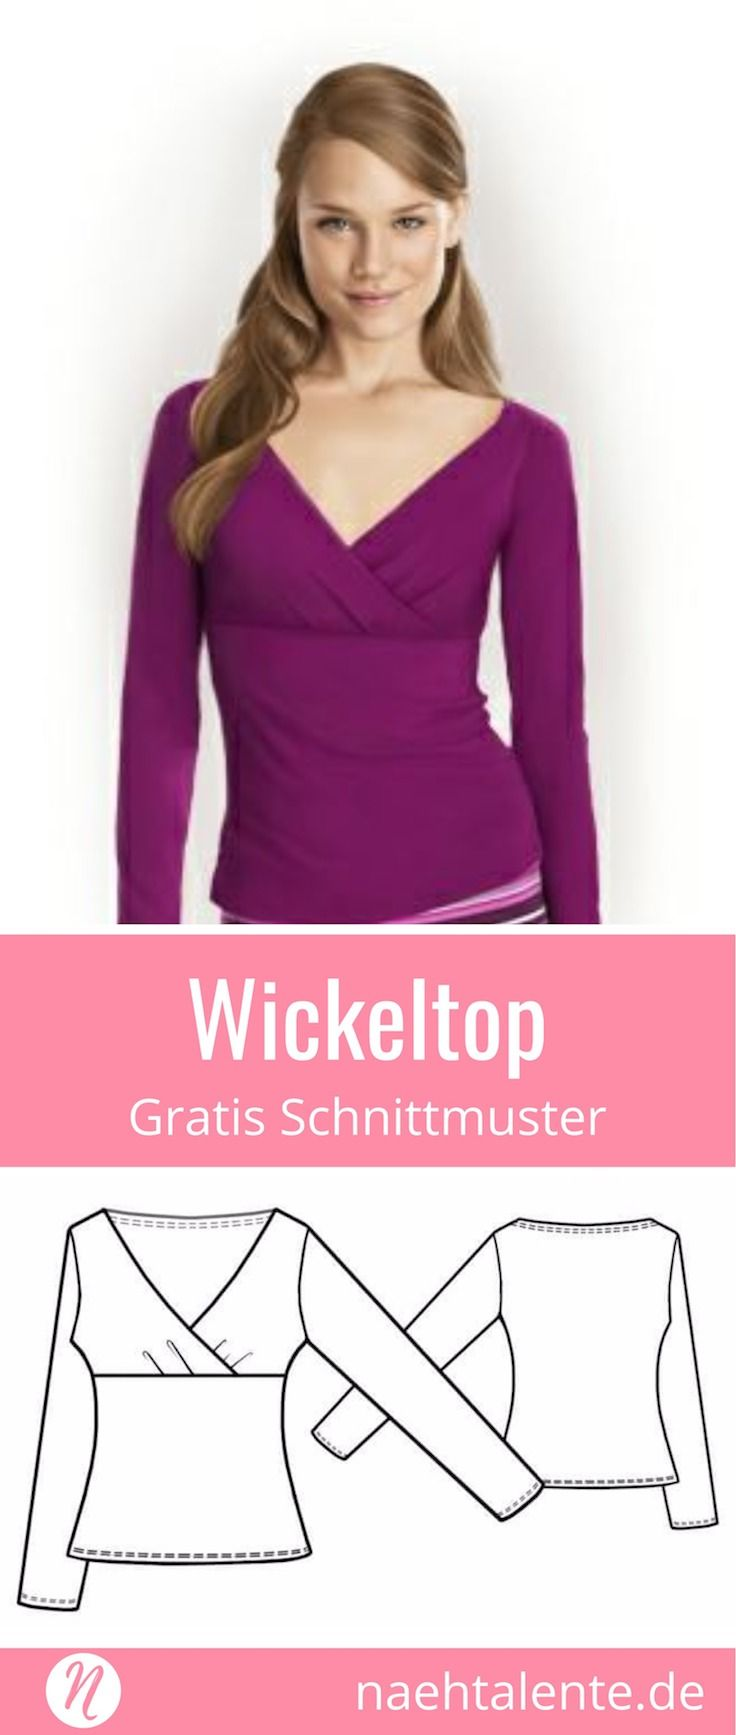 Wickelshirt für Damen #shirtschnittmuster